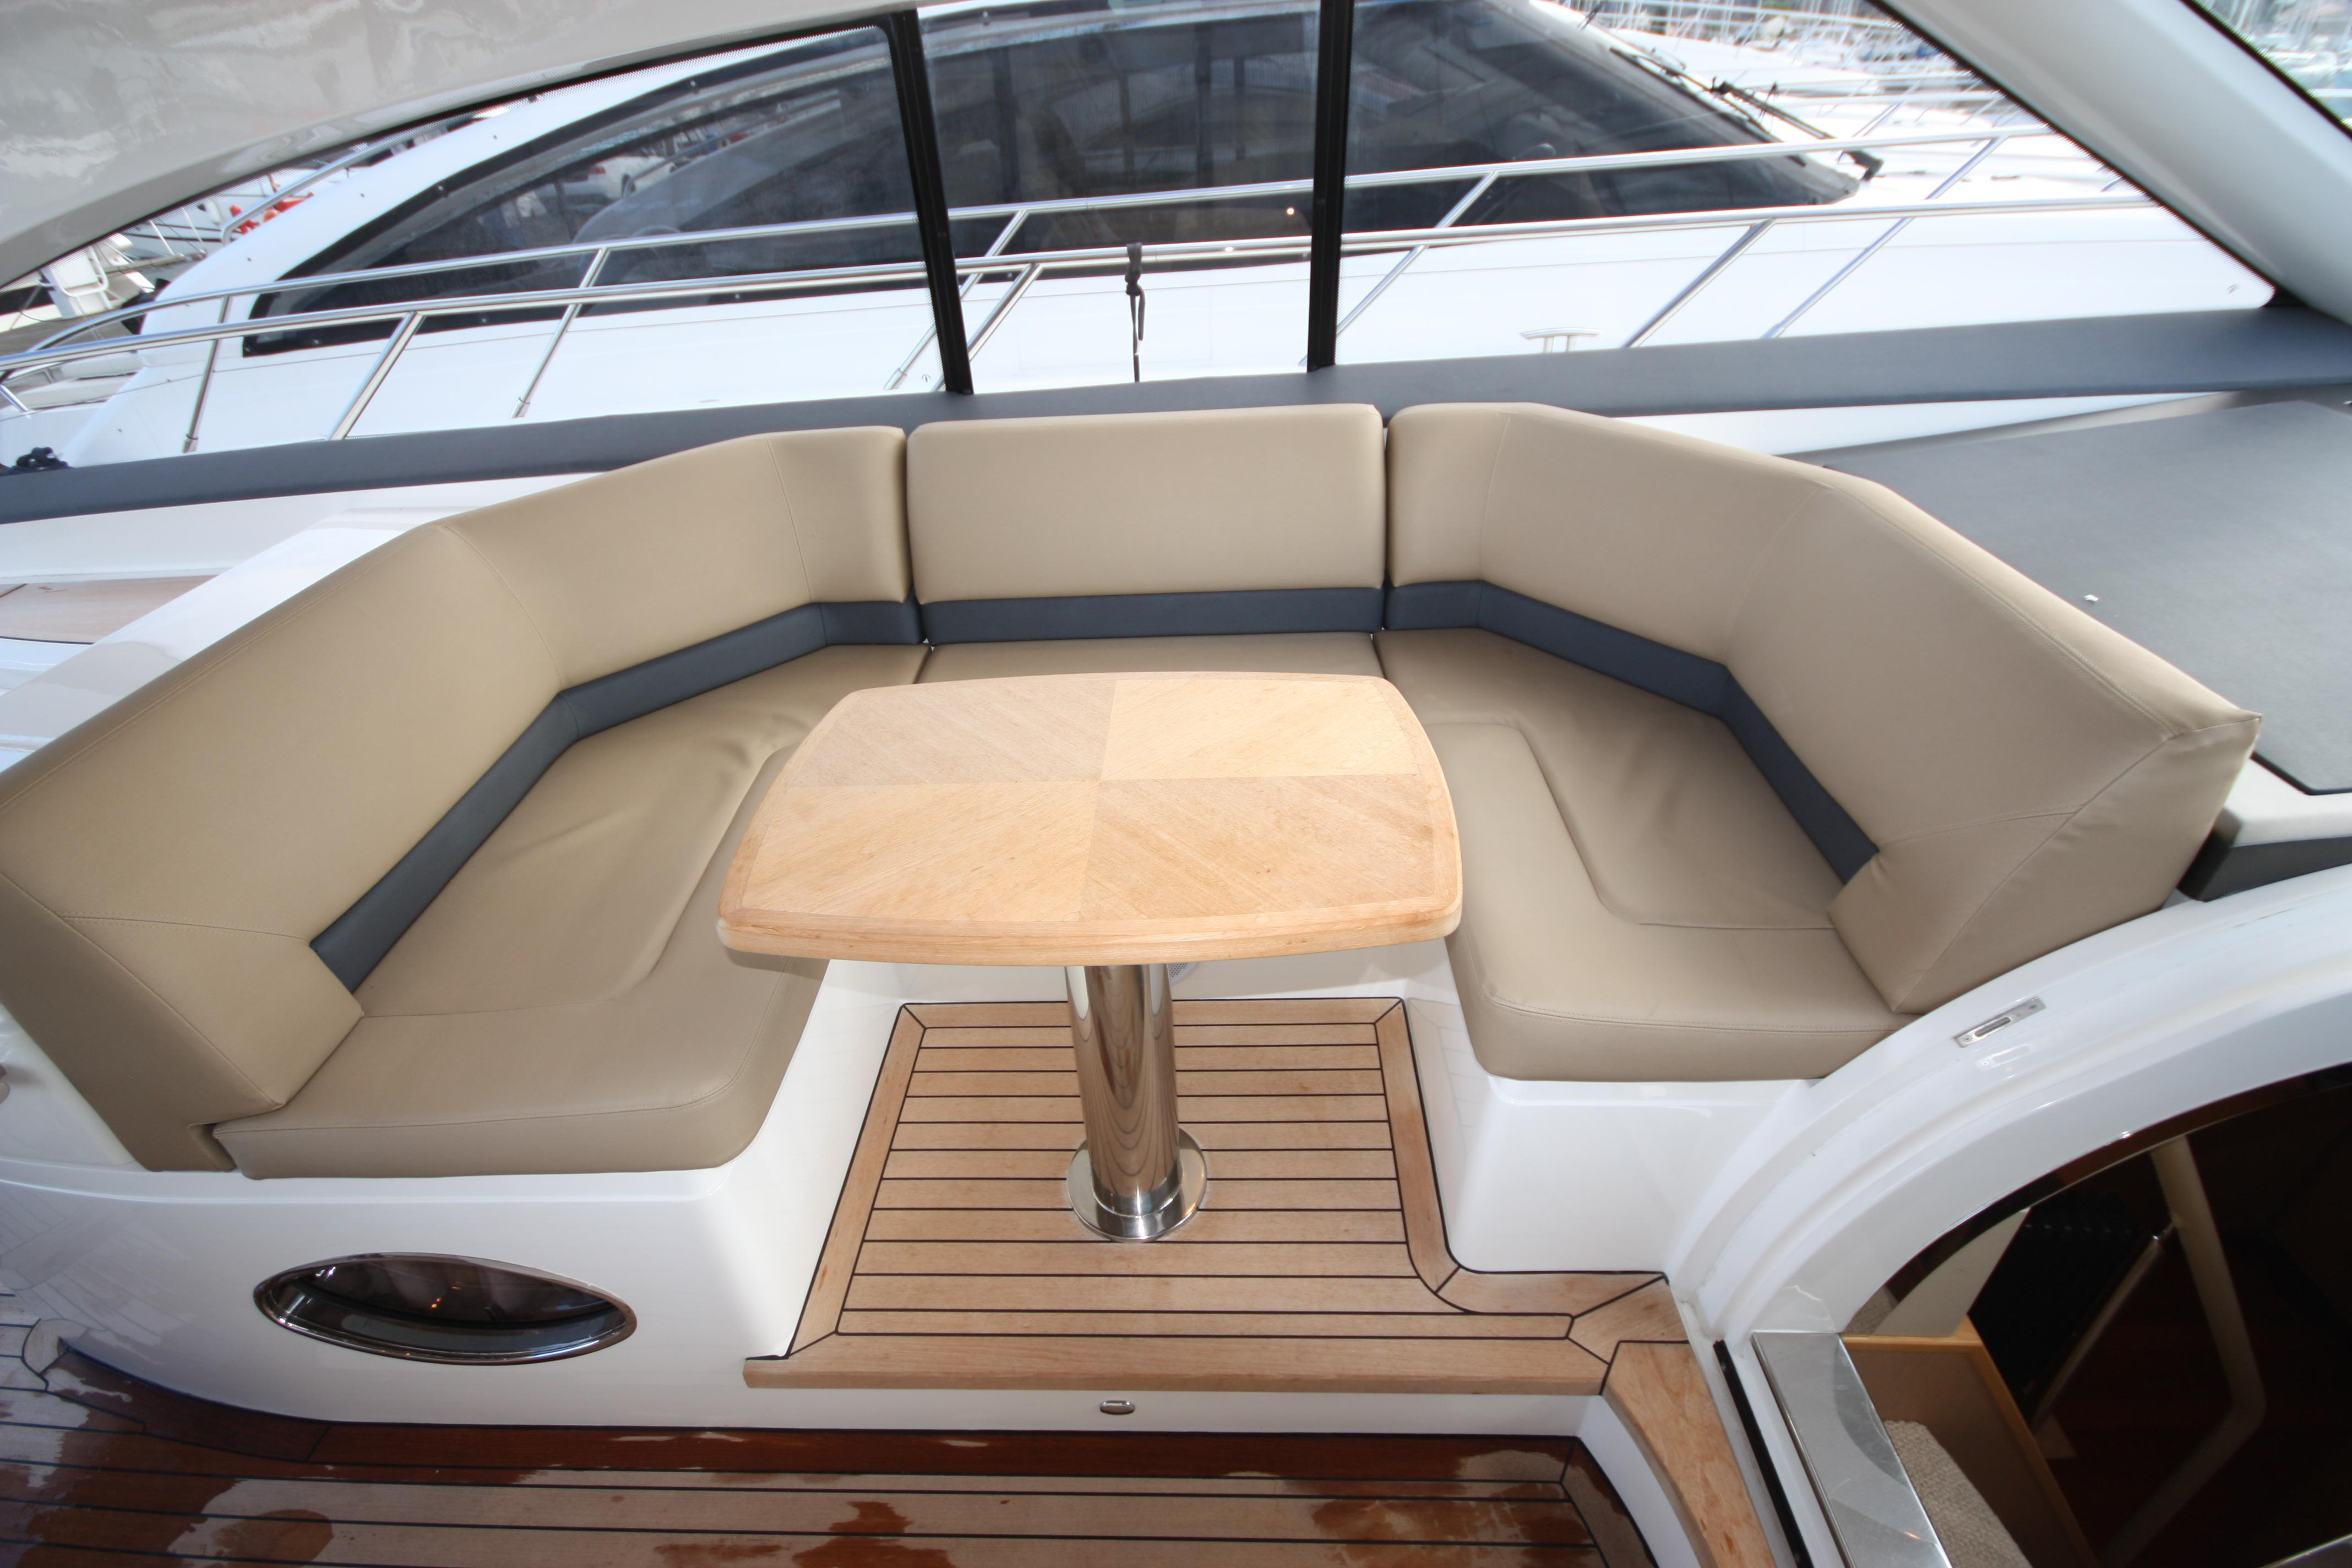 Actual Boat 1/12/2016